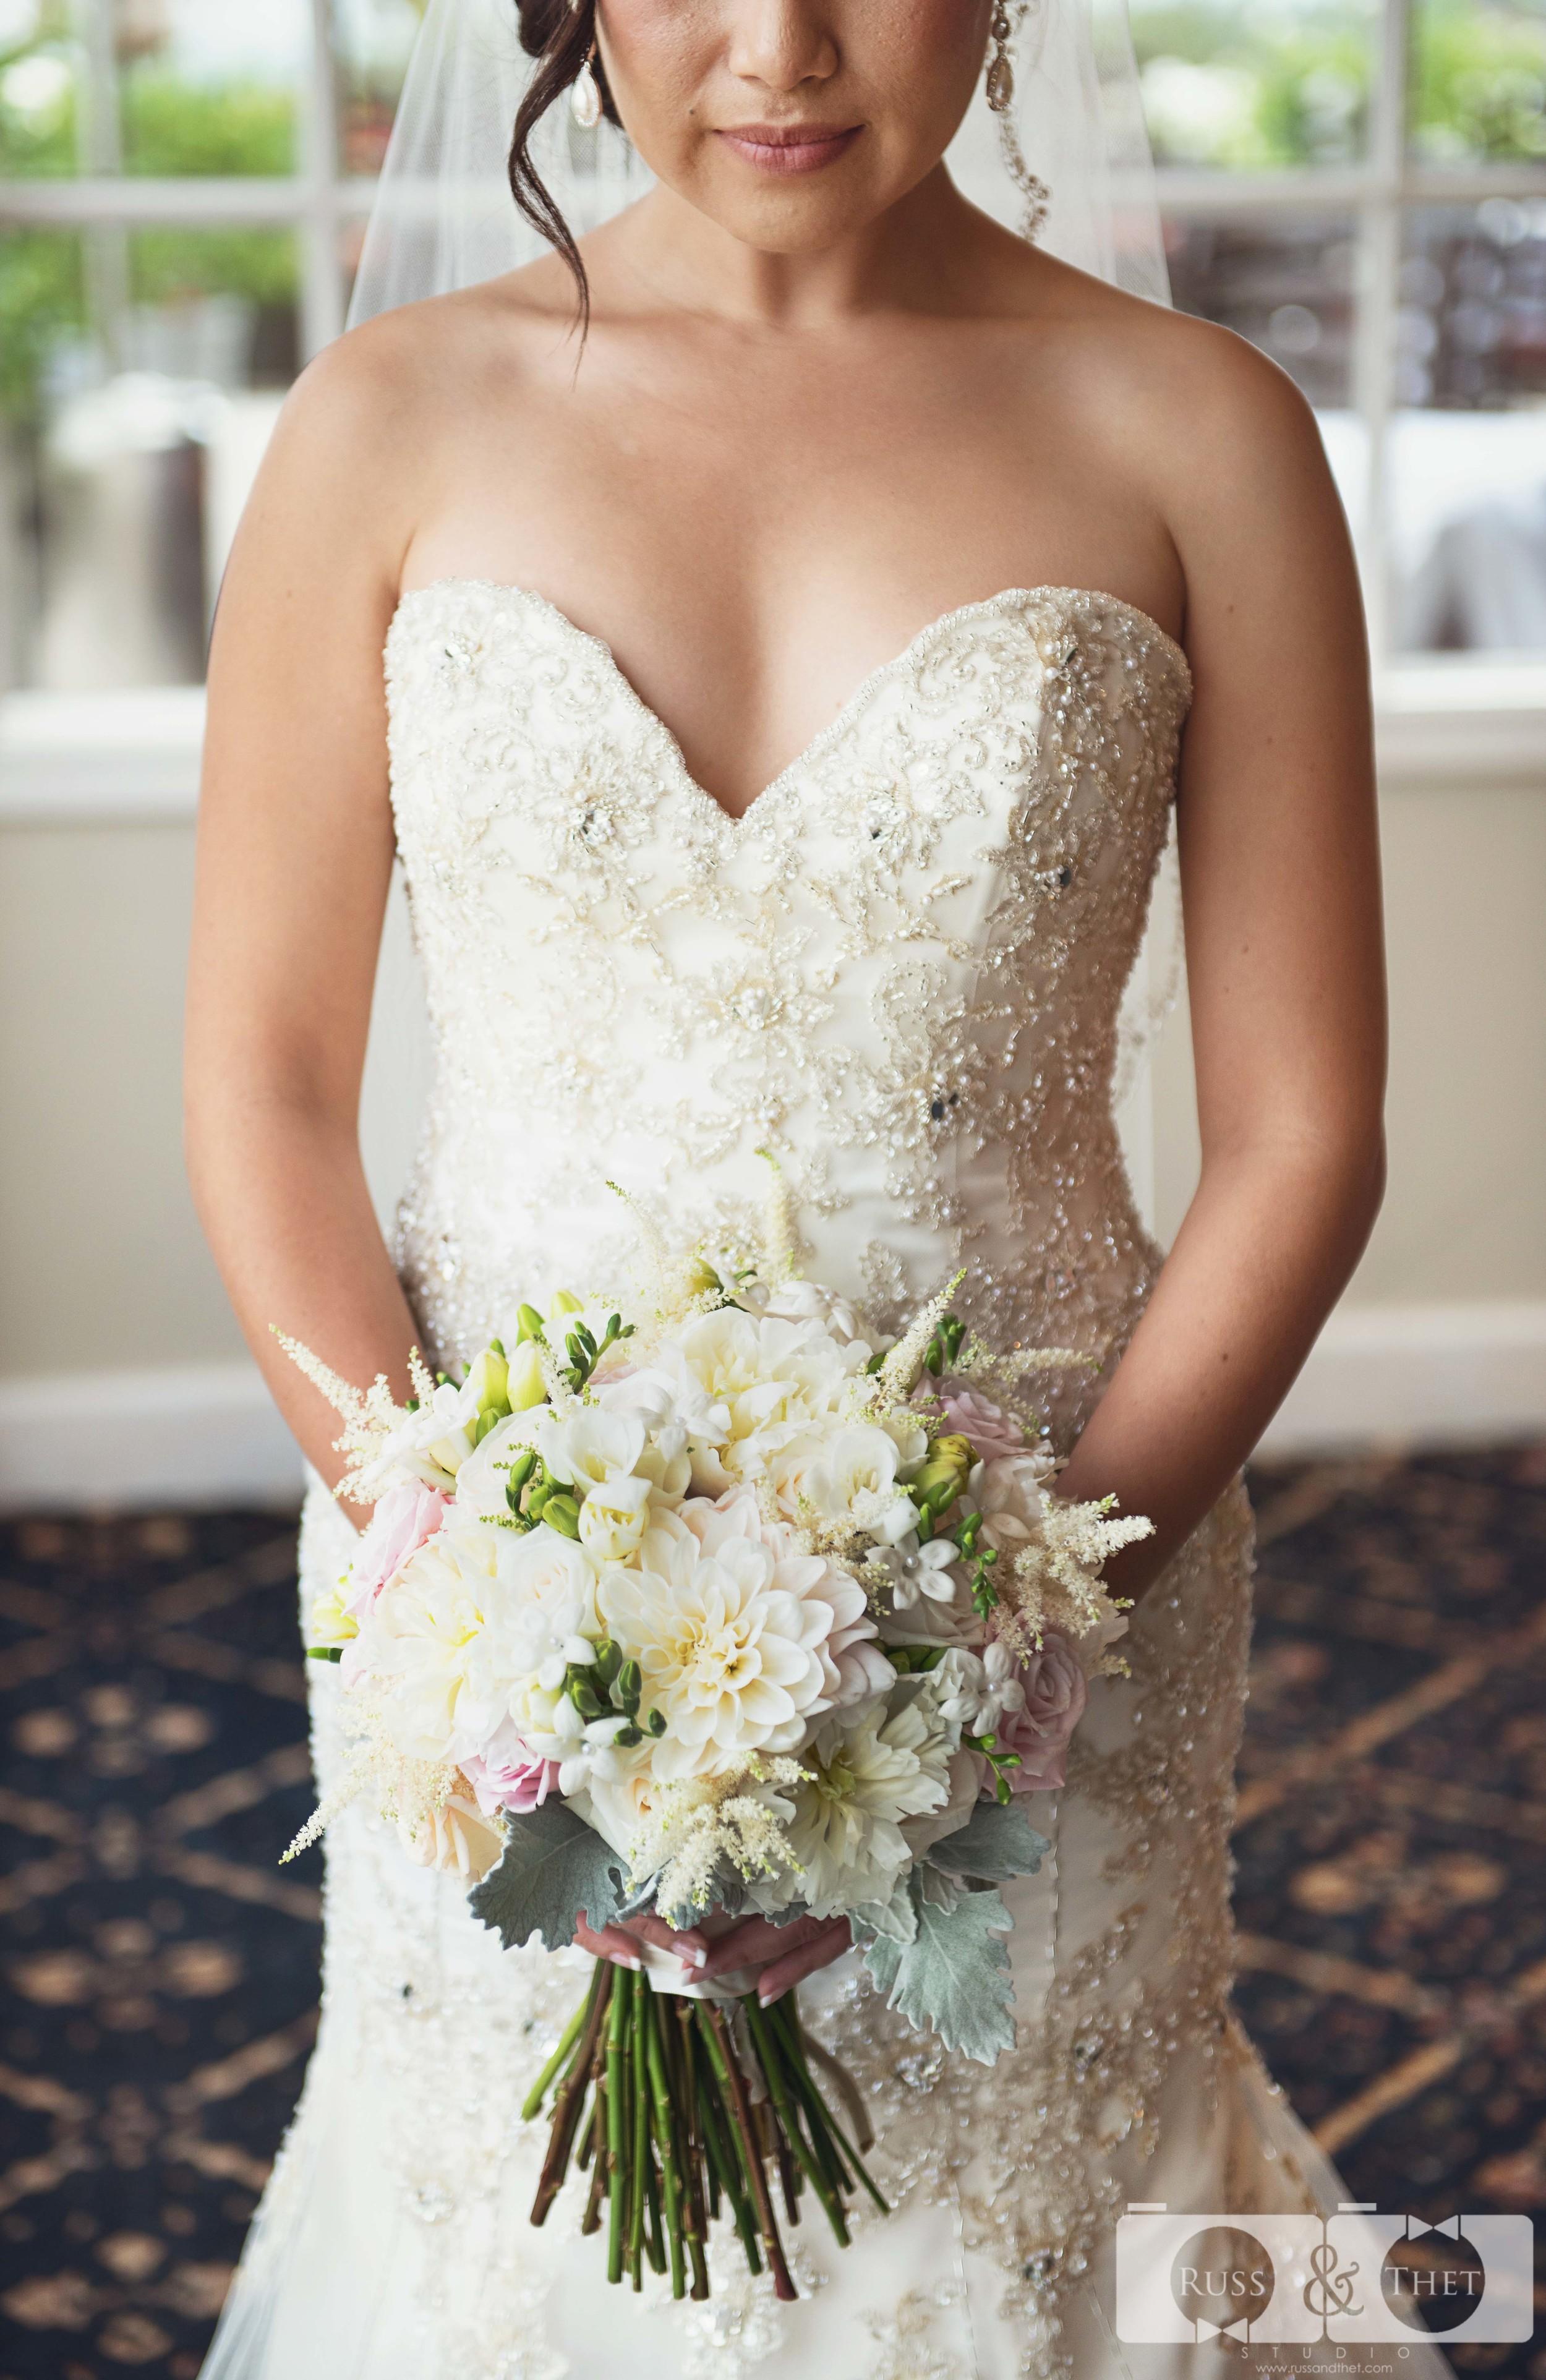 summit-house-fullerton-wedding-photographer-69.JPG